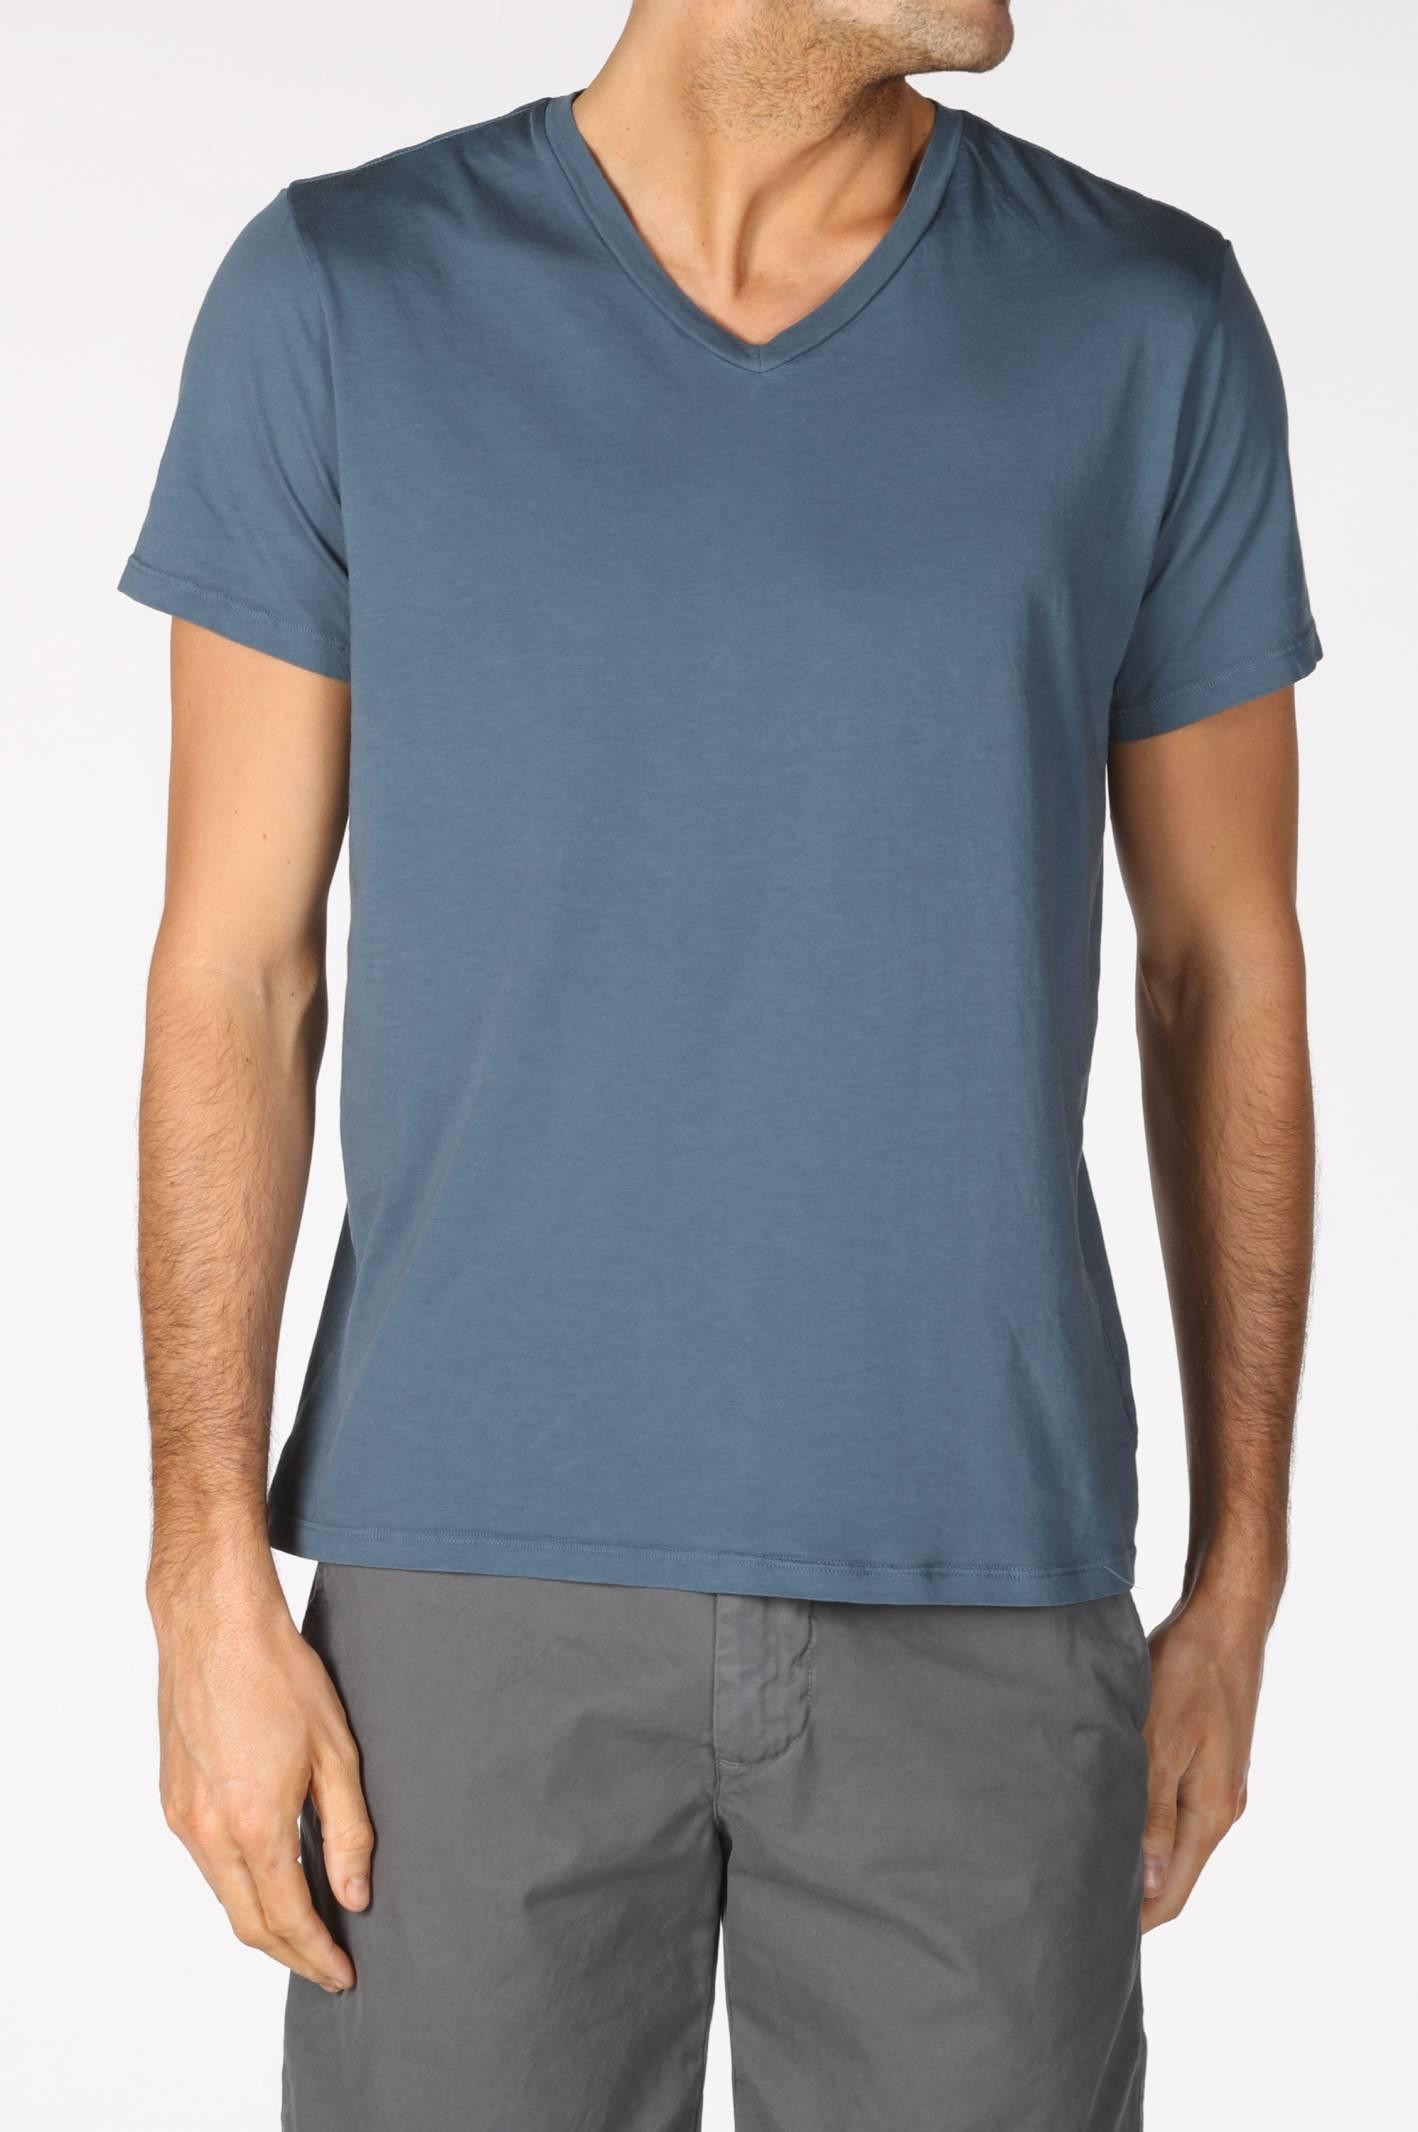 save khaki, v-neck tee, t shirt, v-neck